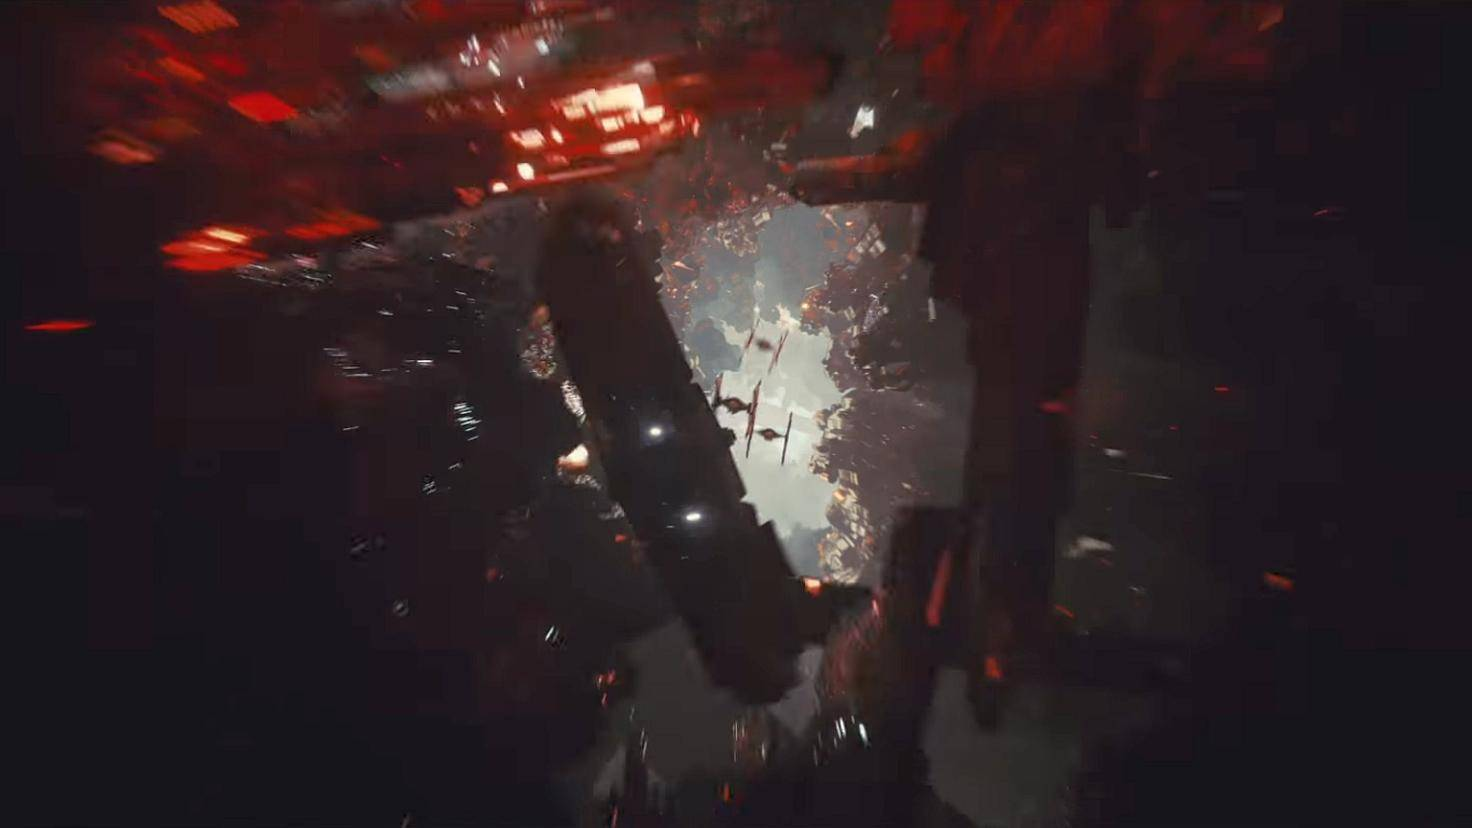 star-wars-die-letzten-jedi-trailer-crait-falke-youtube